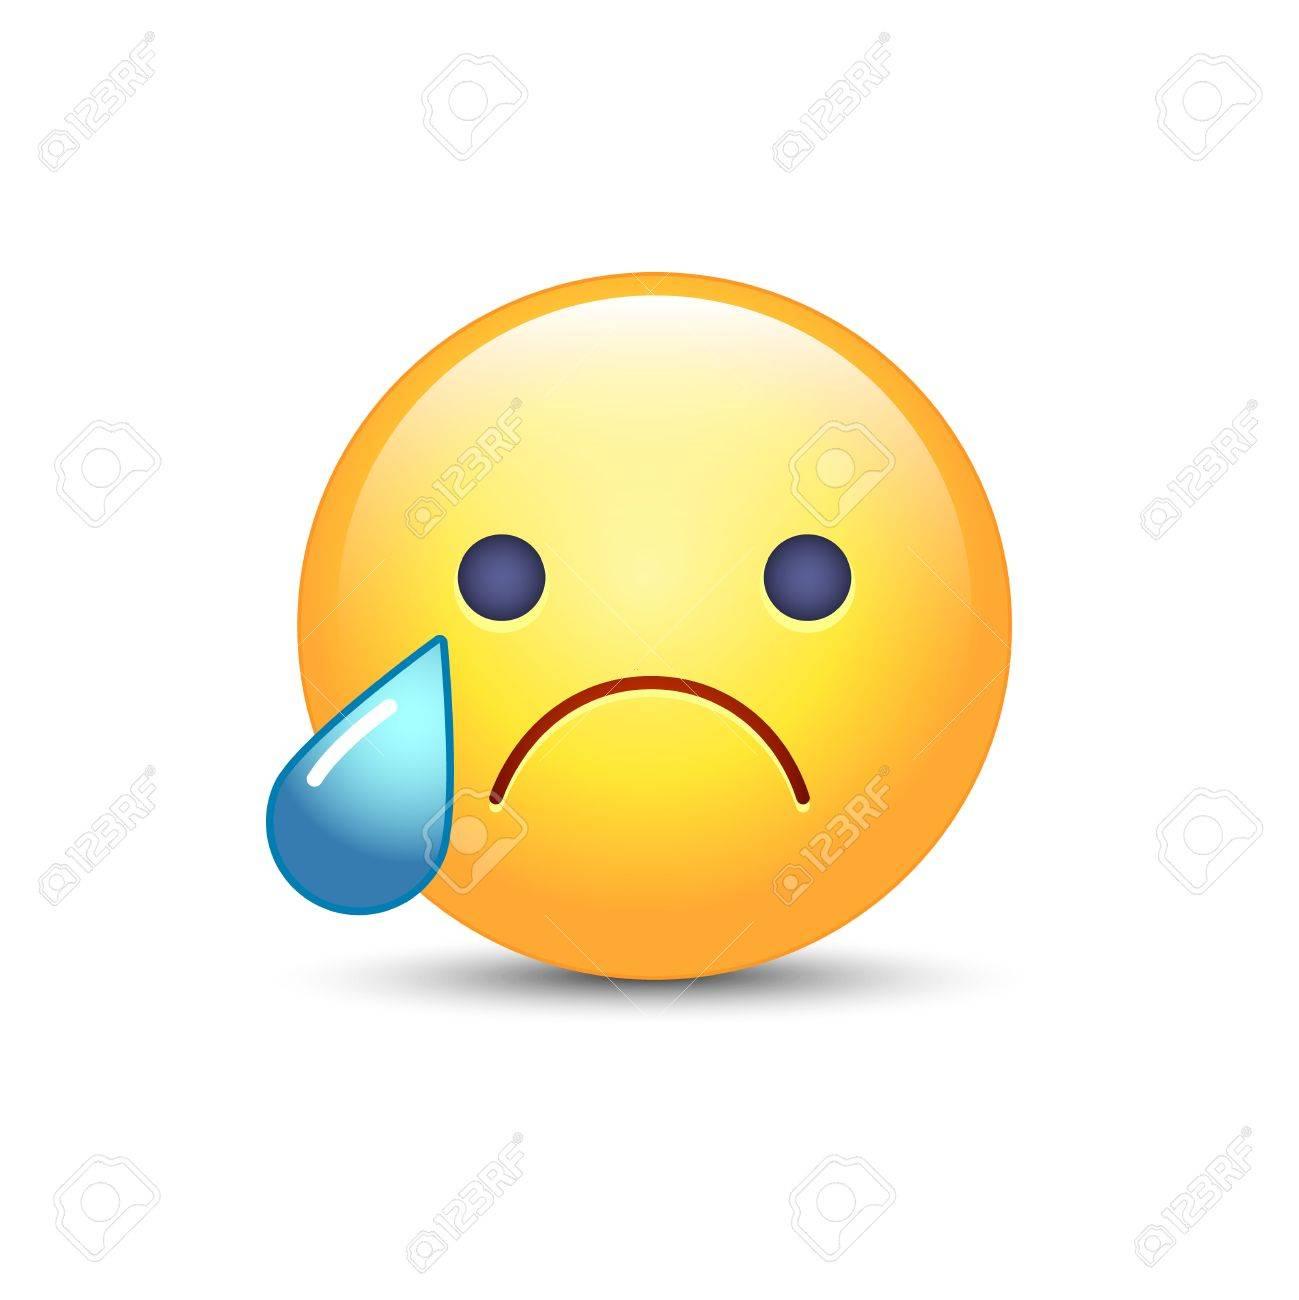 Visage D Emoji Decu Smiley De Dessin Anime De Vecteur Qui Pleure